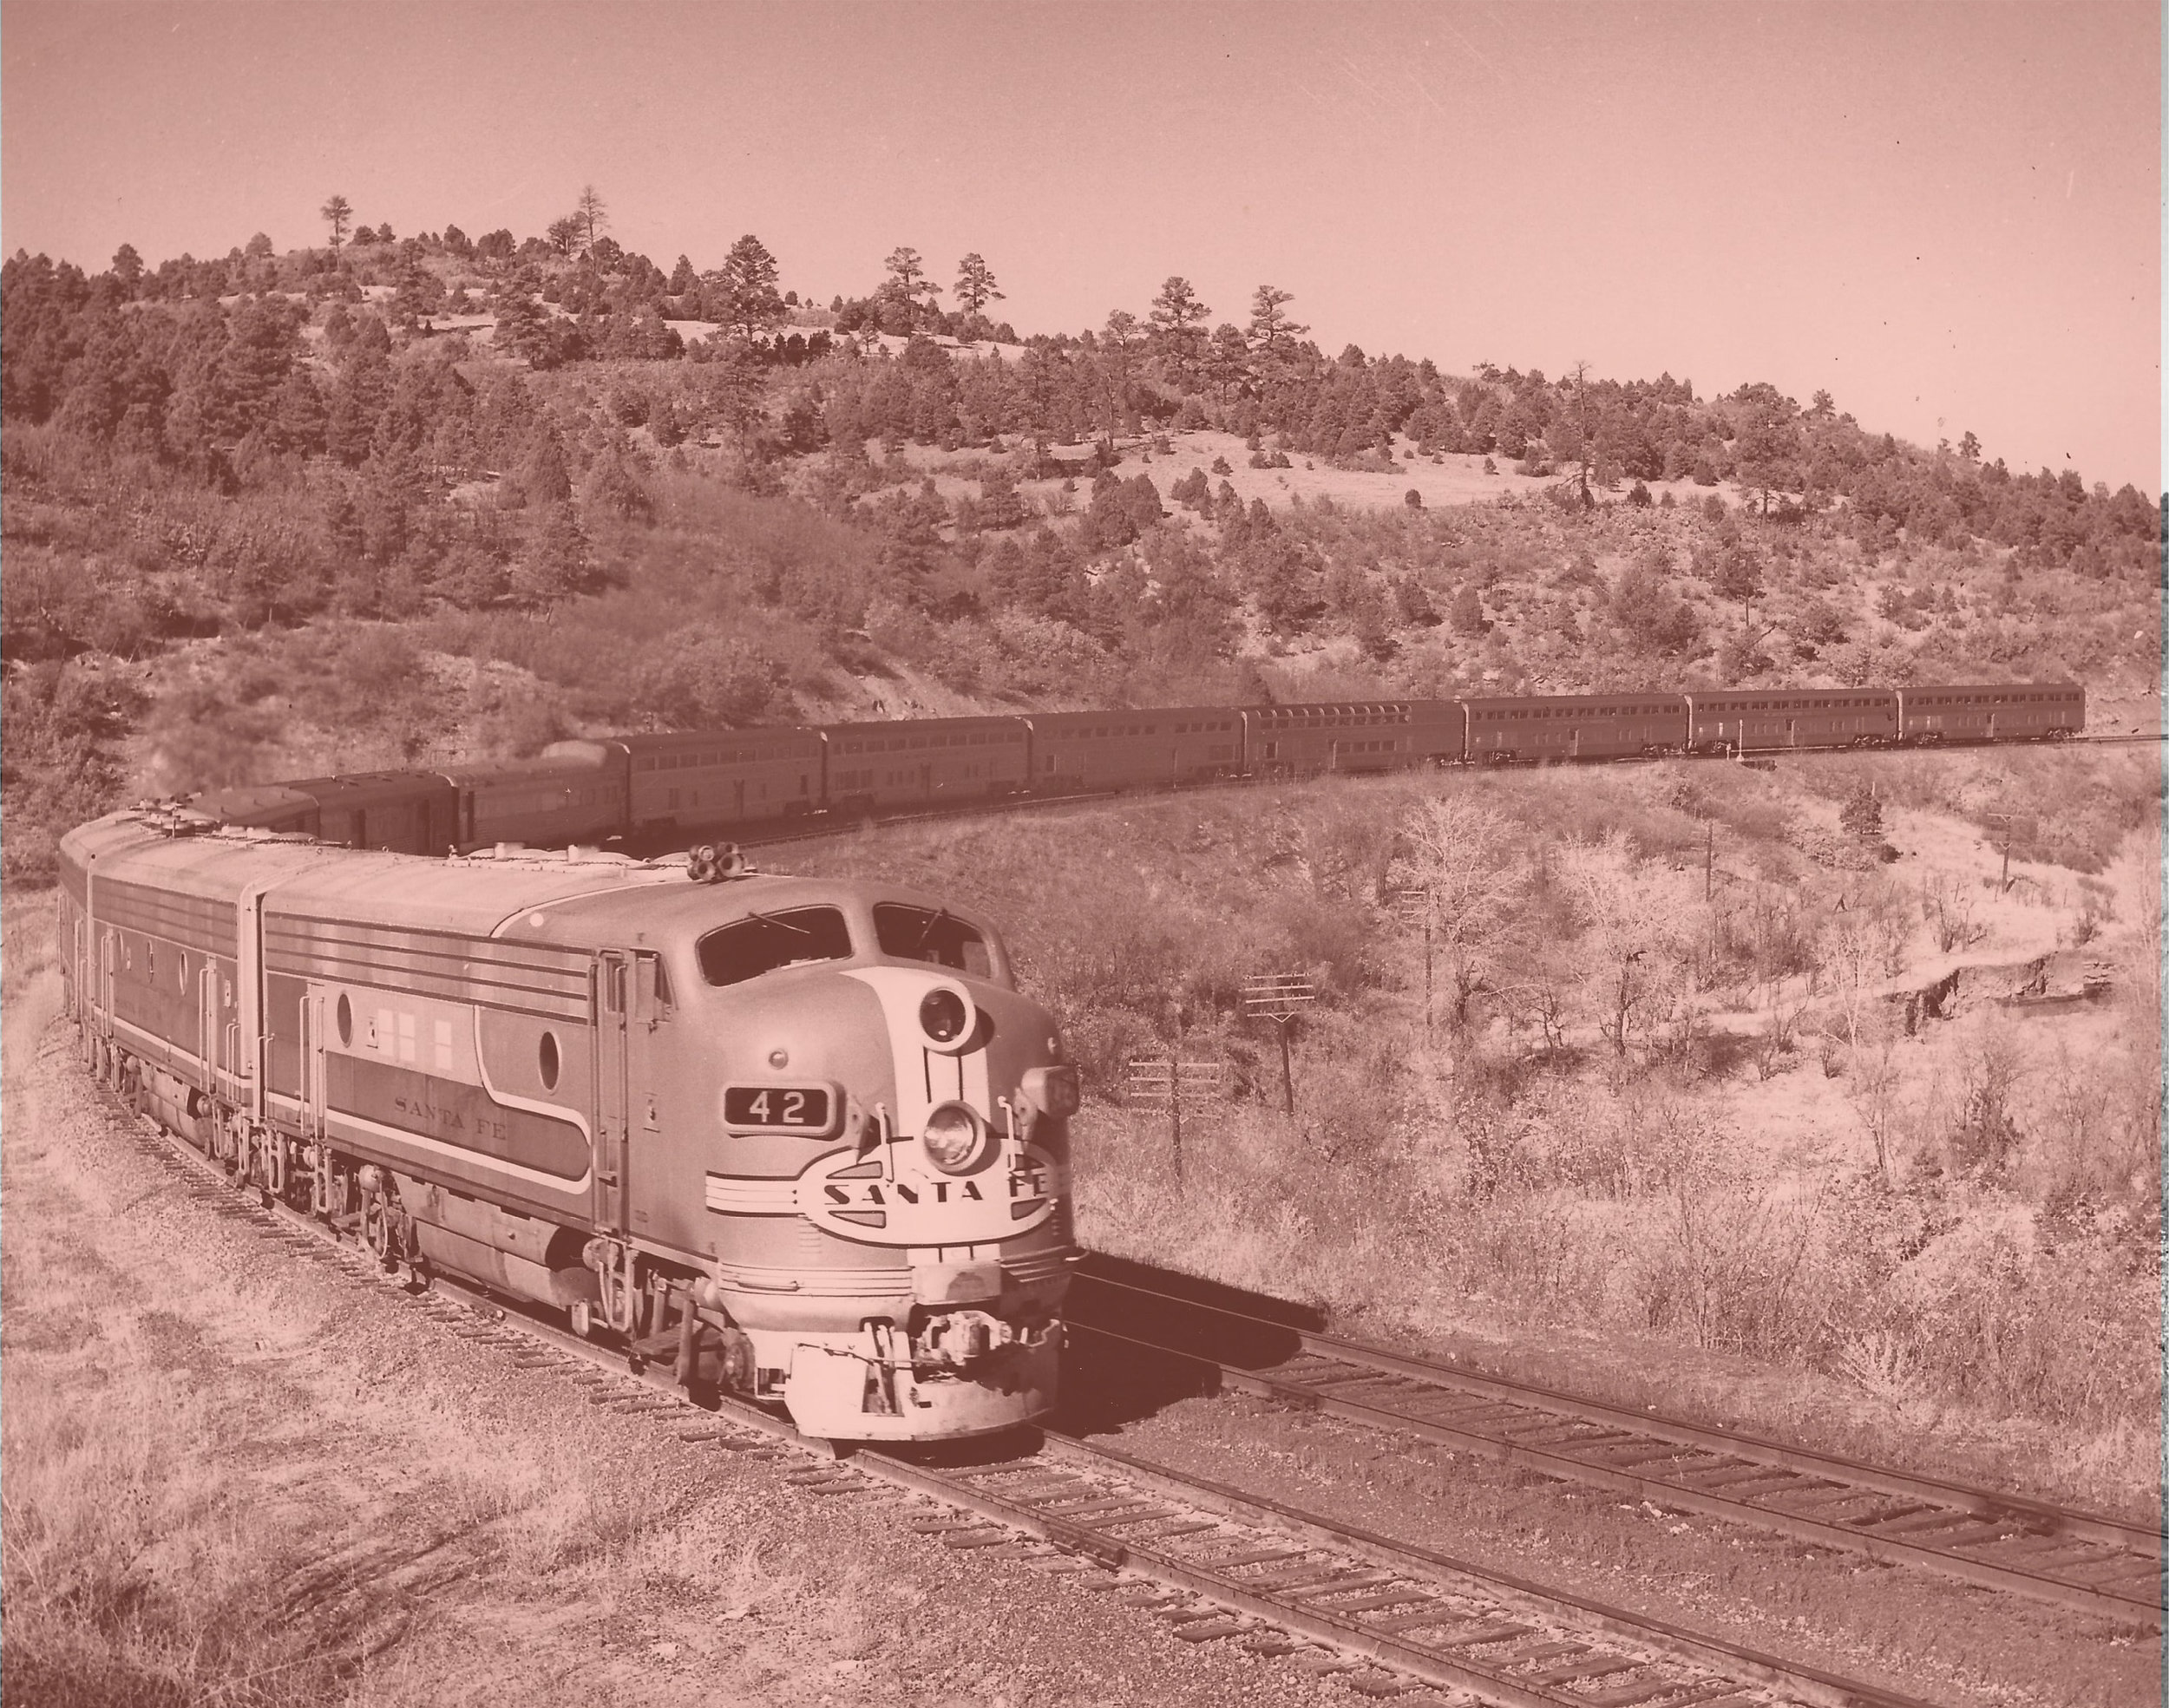 Historic 1950 Santa Fe engine and HI-Level passenger cars